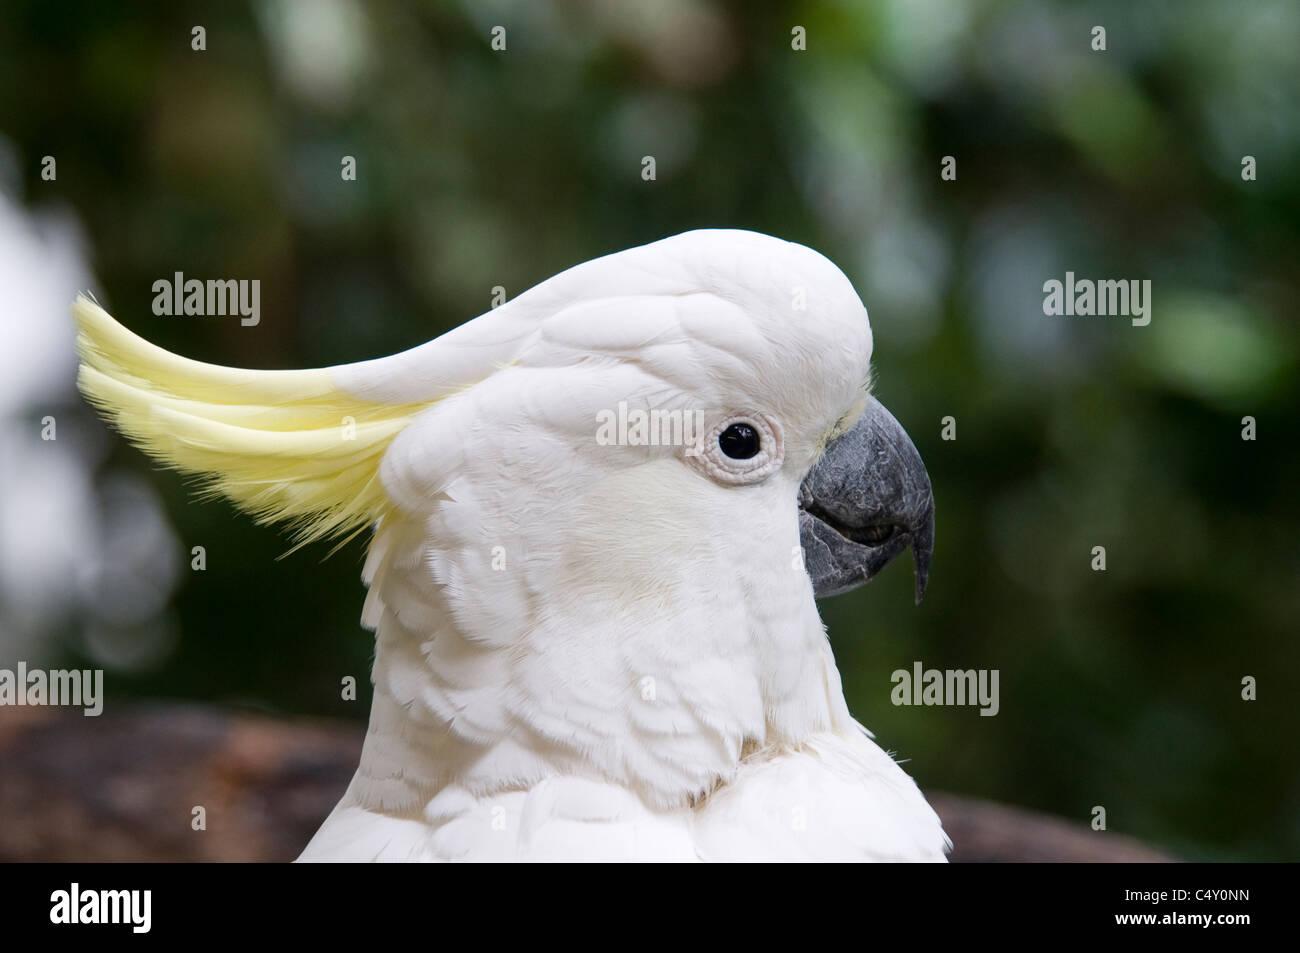 Sulfur-crested cockatoo (Cacatua galerita) at the Cairns Tropical Zoo in Queensland Australia - Stock Image